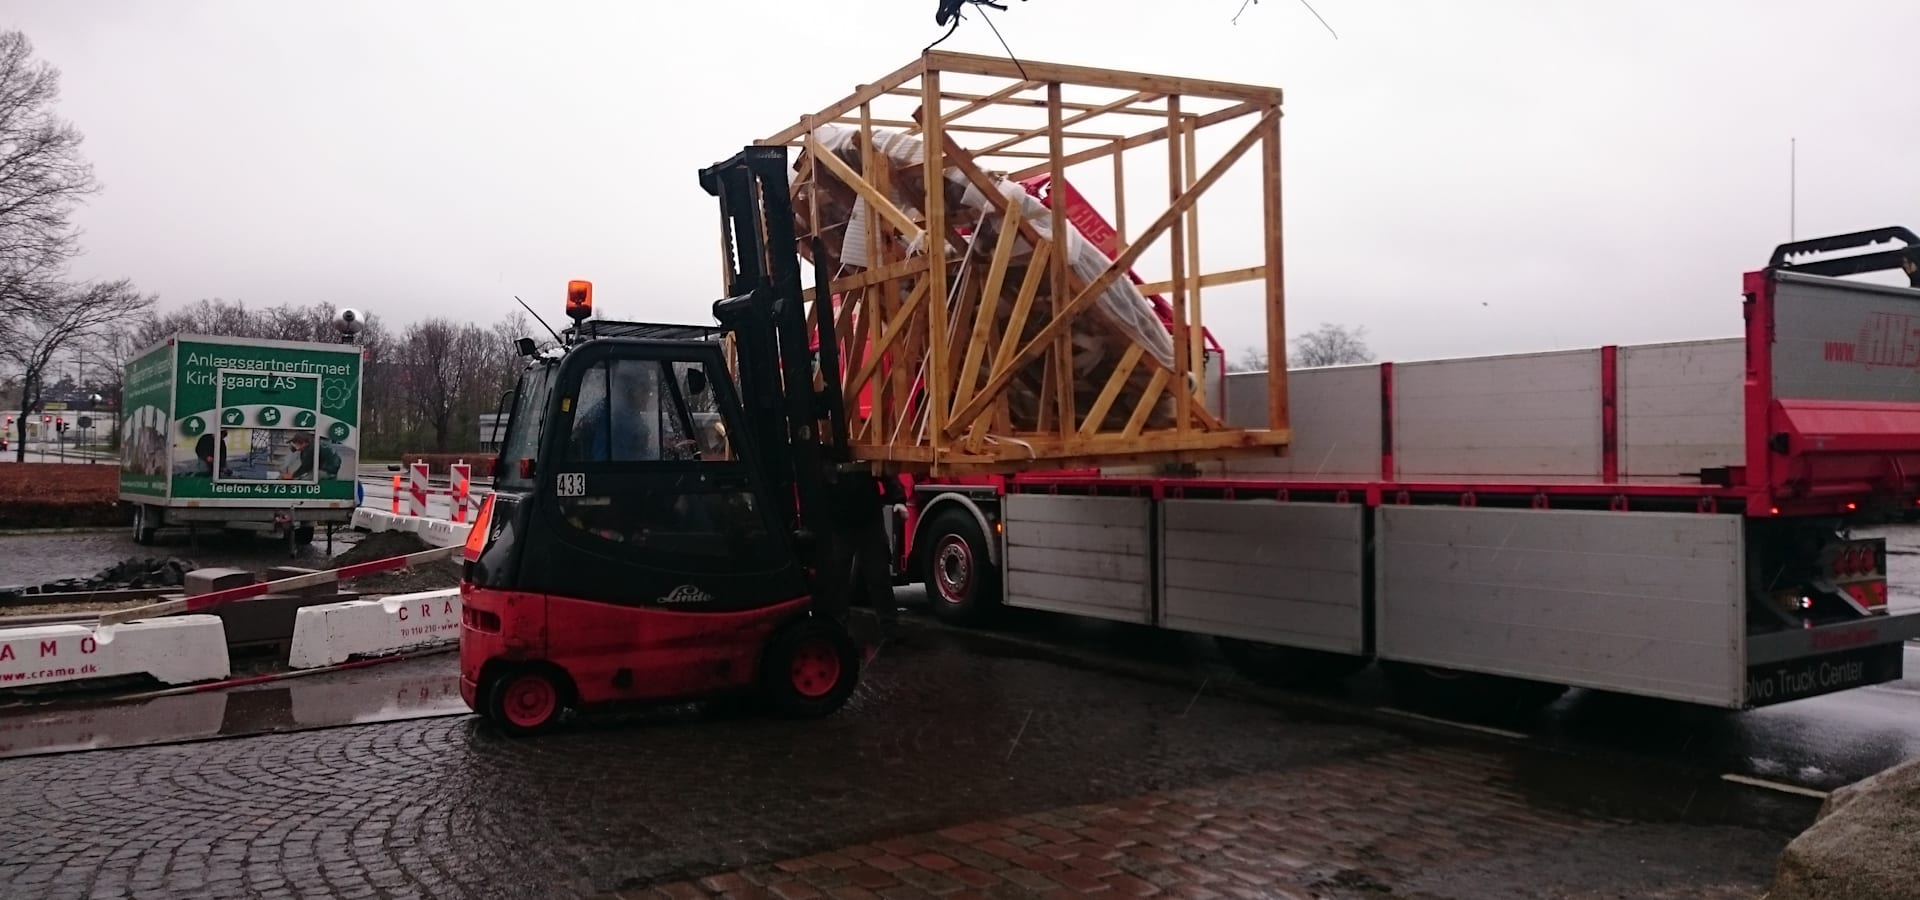 Monarch Moving & Storage (Pty) Ltd